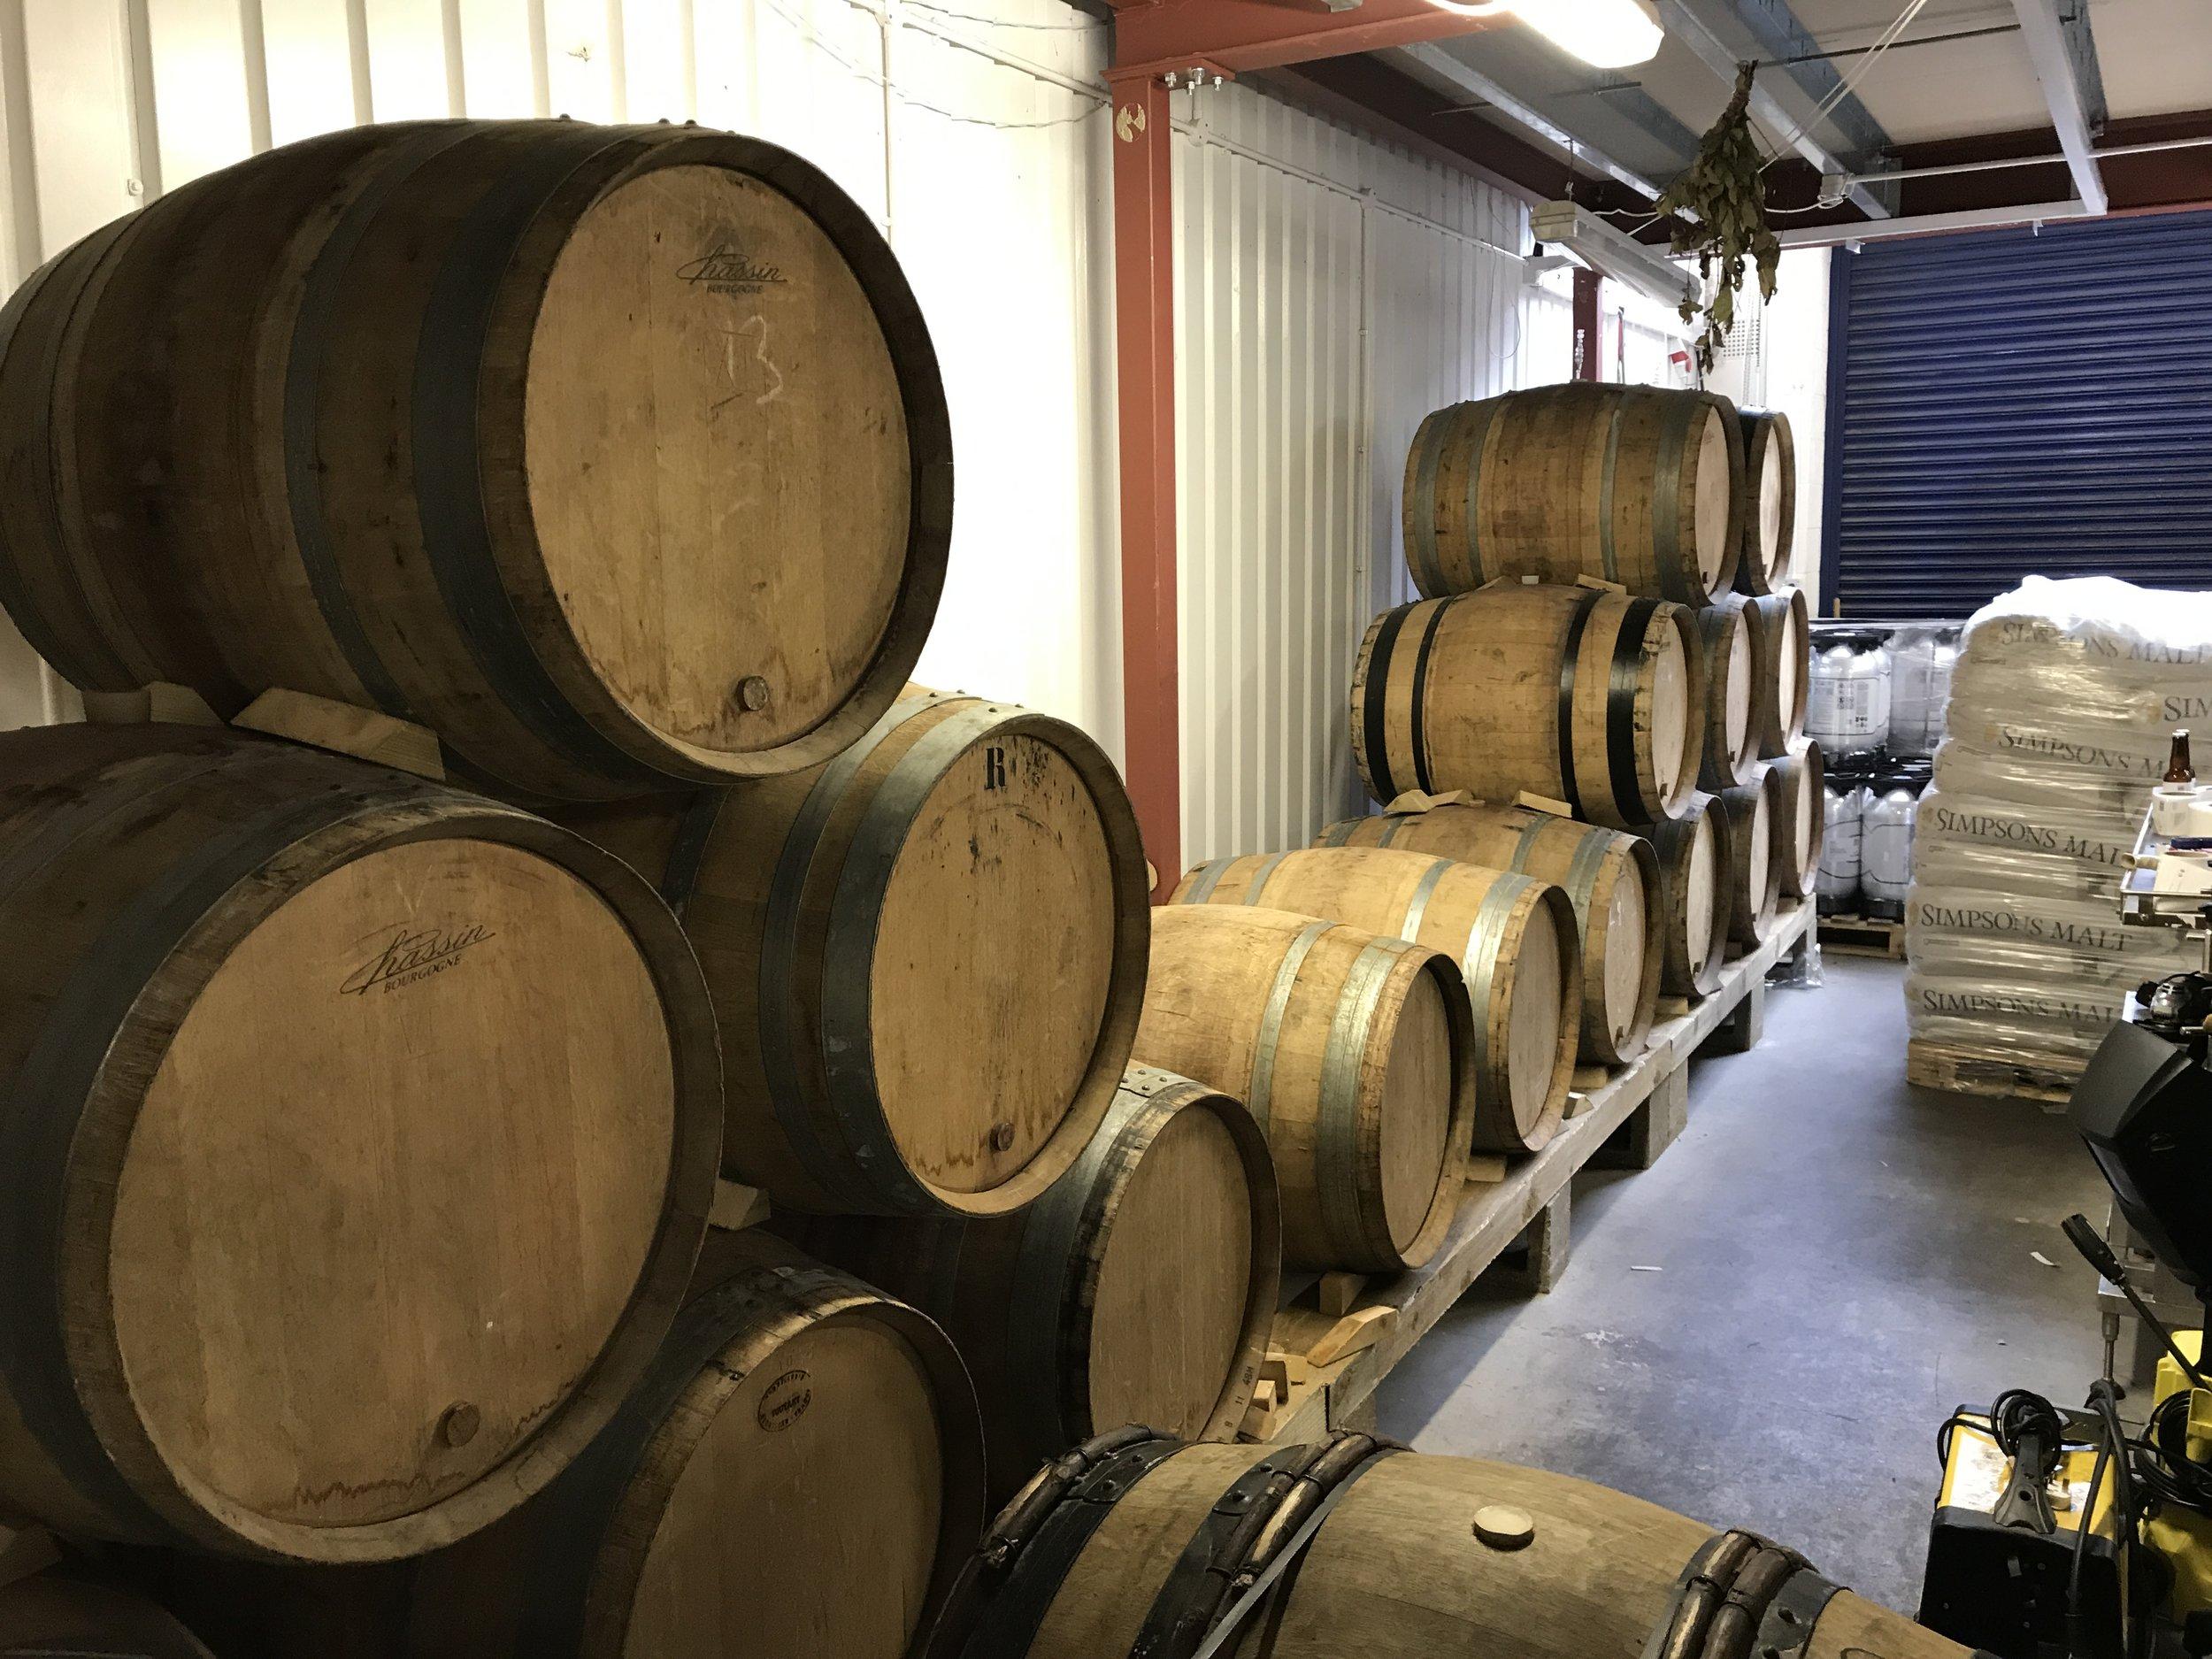 Barrels at Poyer Street